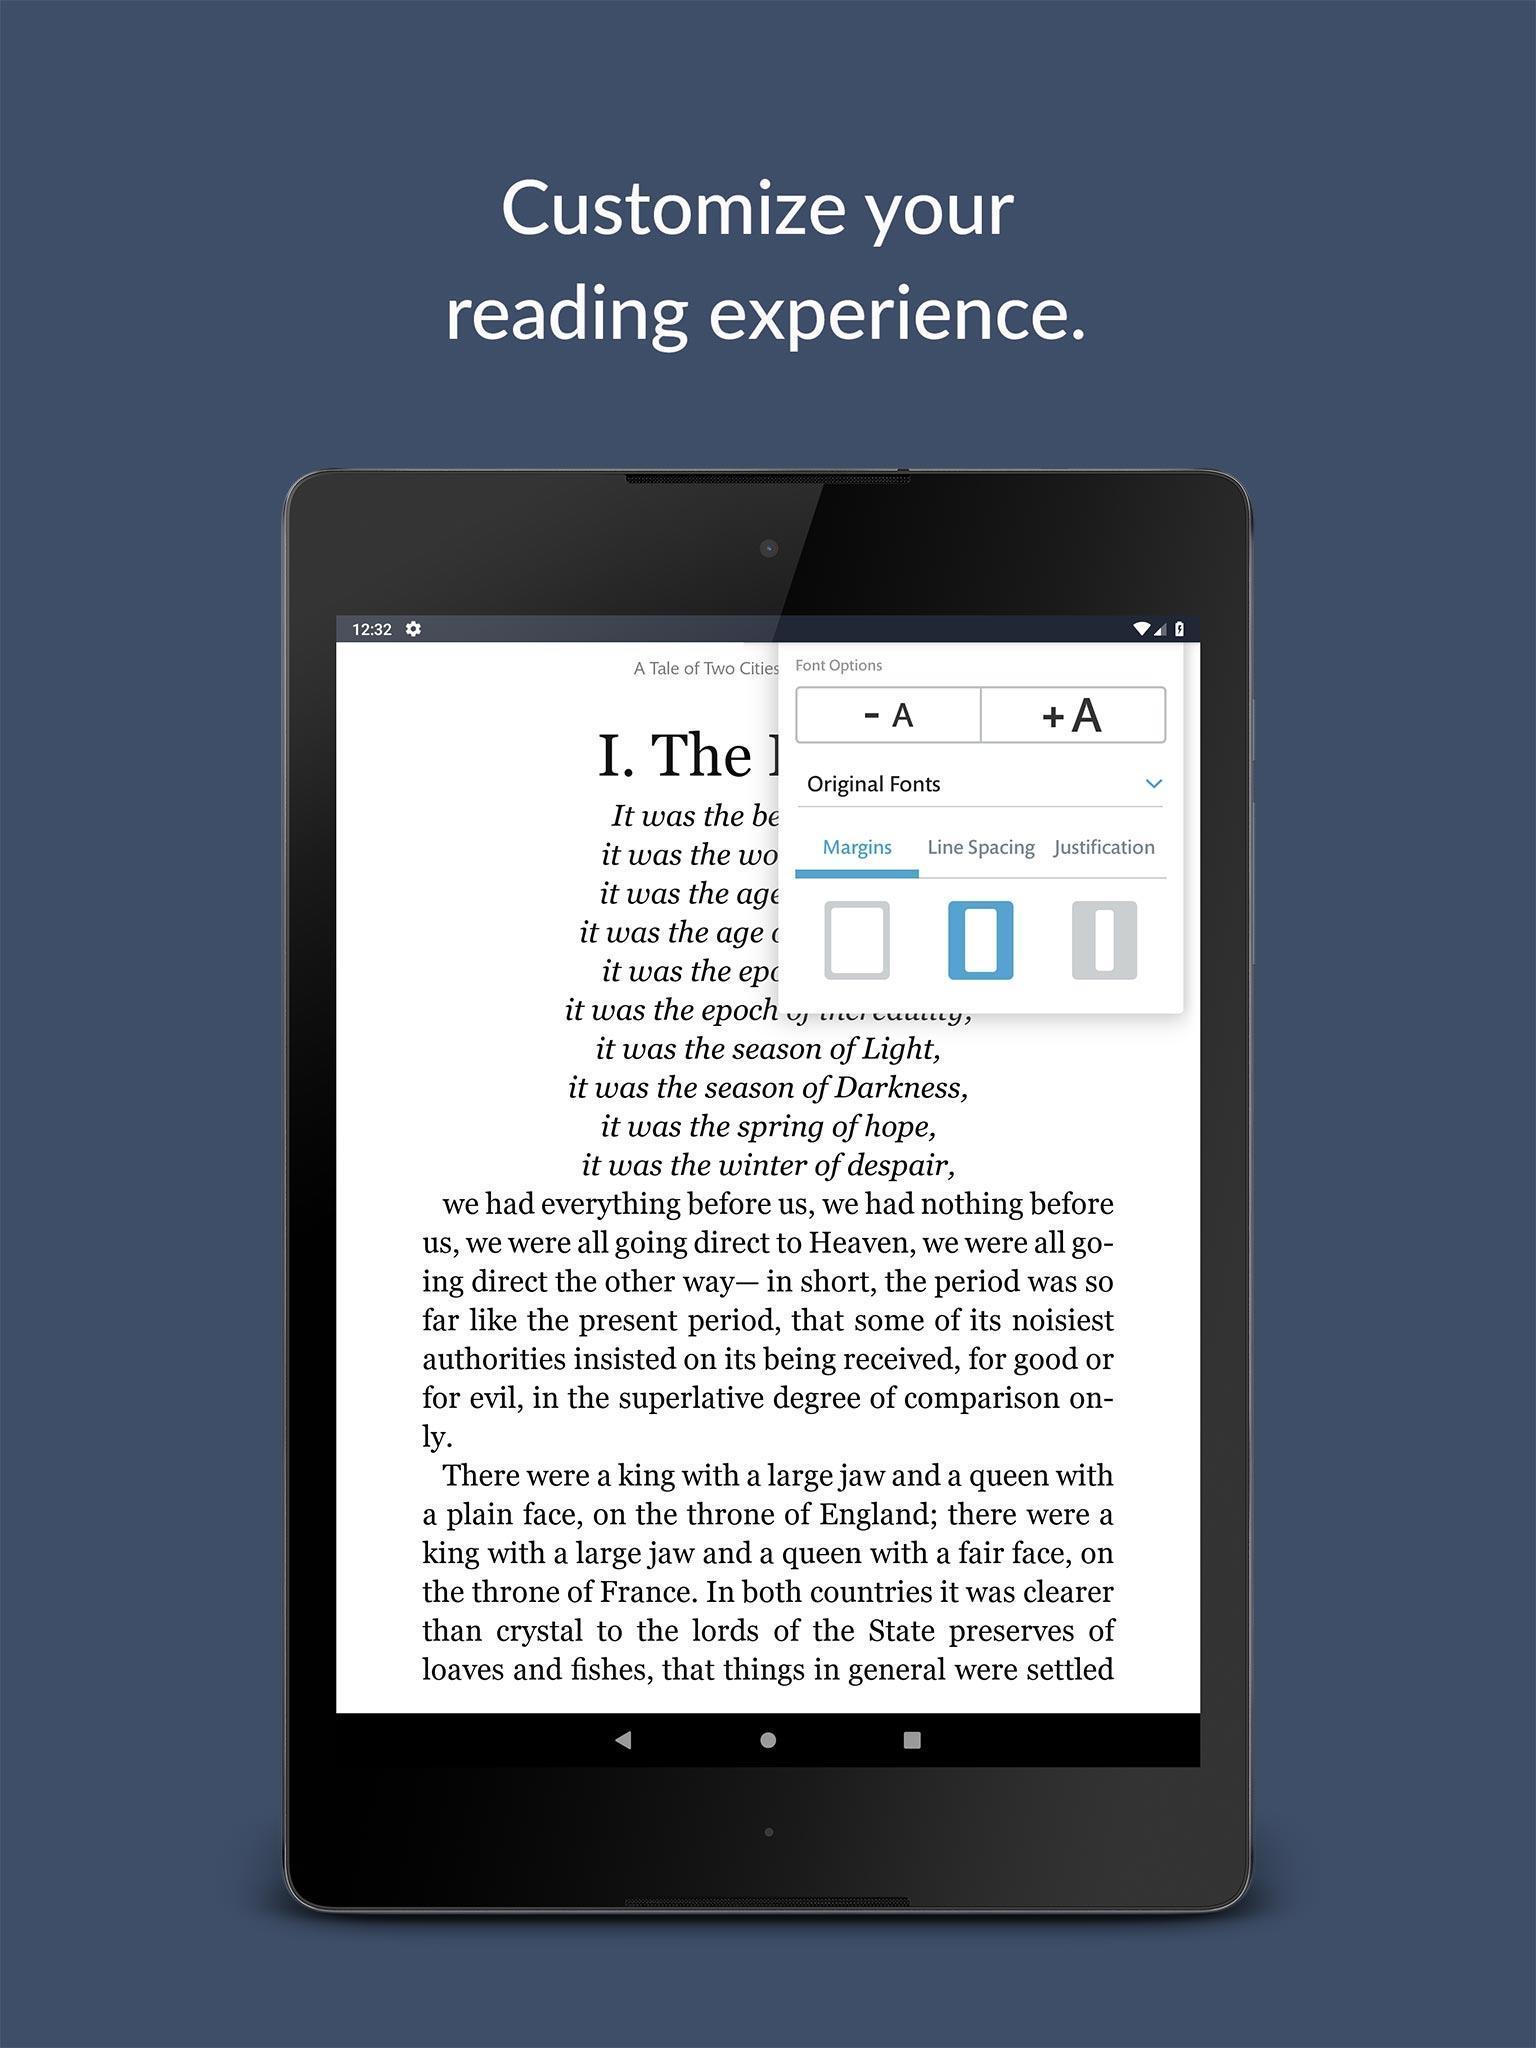 NOOK Read eBooks & Magazines 5.1.0.27 Screenshot 10